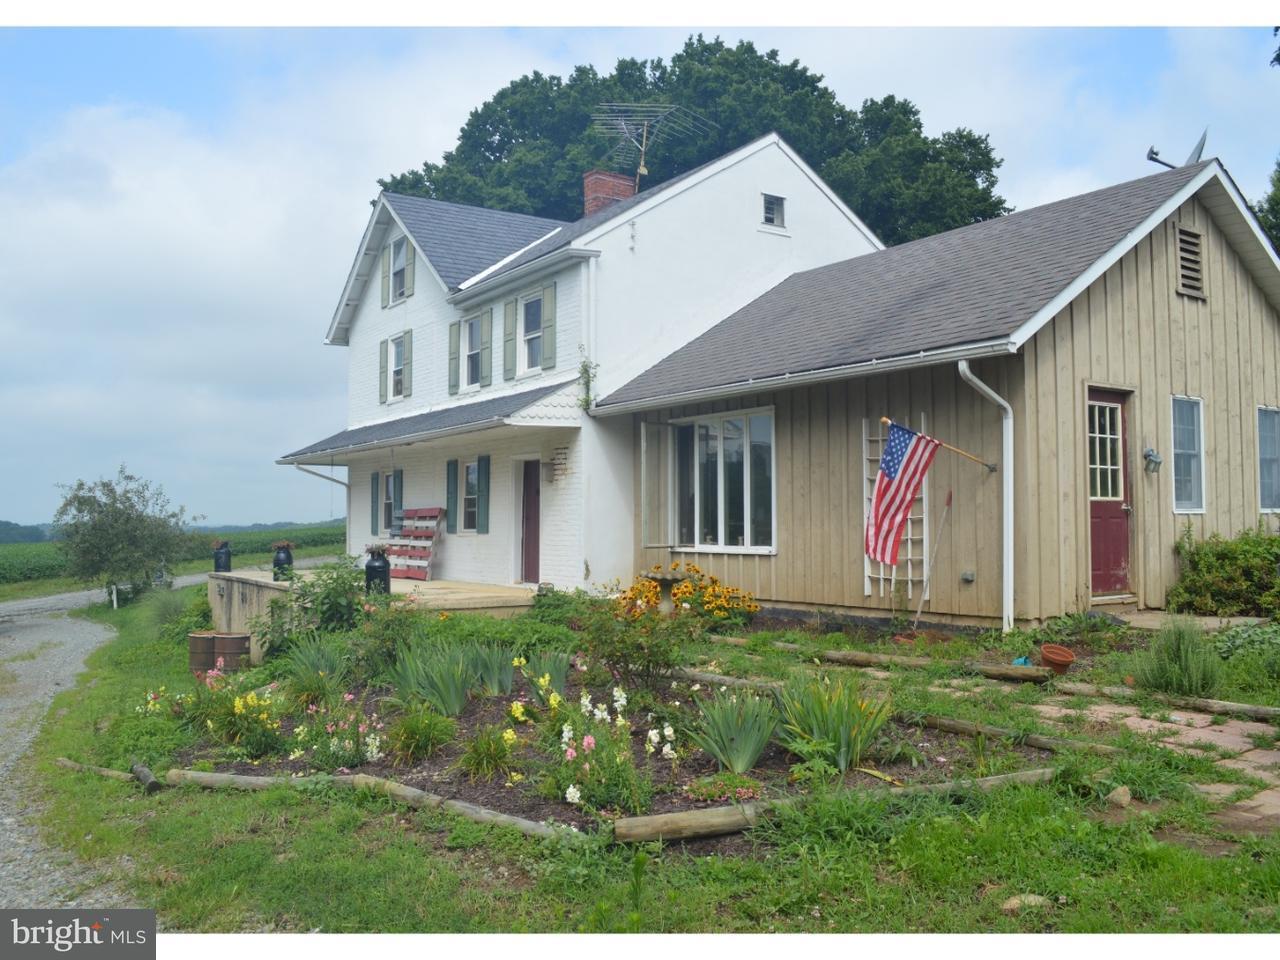 Single Family Home for Sale at 30 KIMBLE Road Nottingham, Pennsylvania 19362 United States